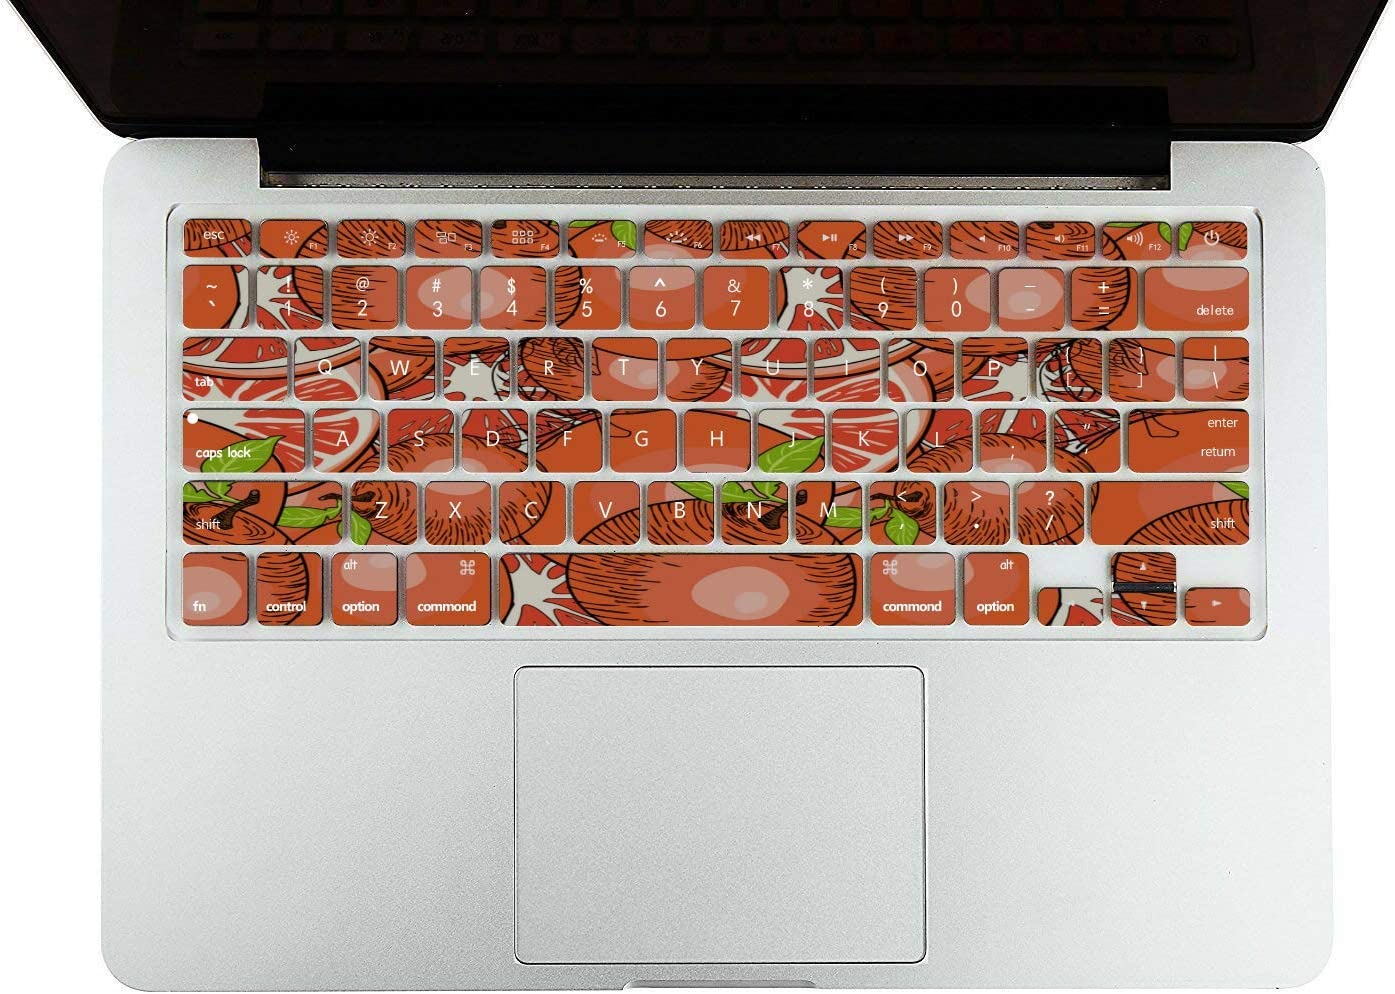 Mac Computer Case Summer Fruit Grapefruit Green Leaf Plastic Hard Shell Compatible Mac Air 11 Pro 13 15 Mackbook Pro Case Protection for MacBook 2016-2019 Version